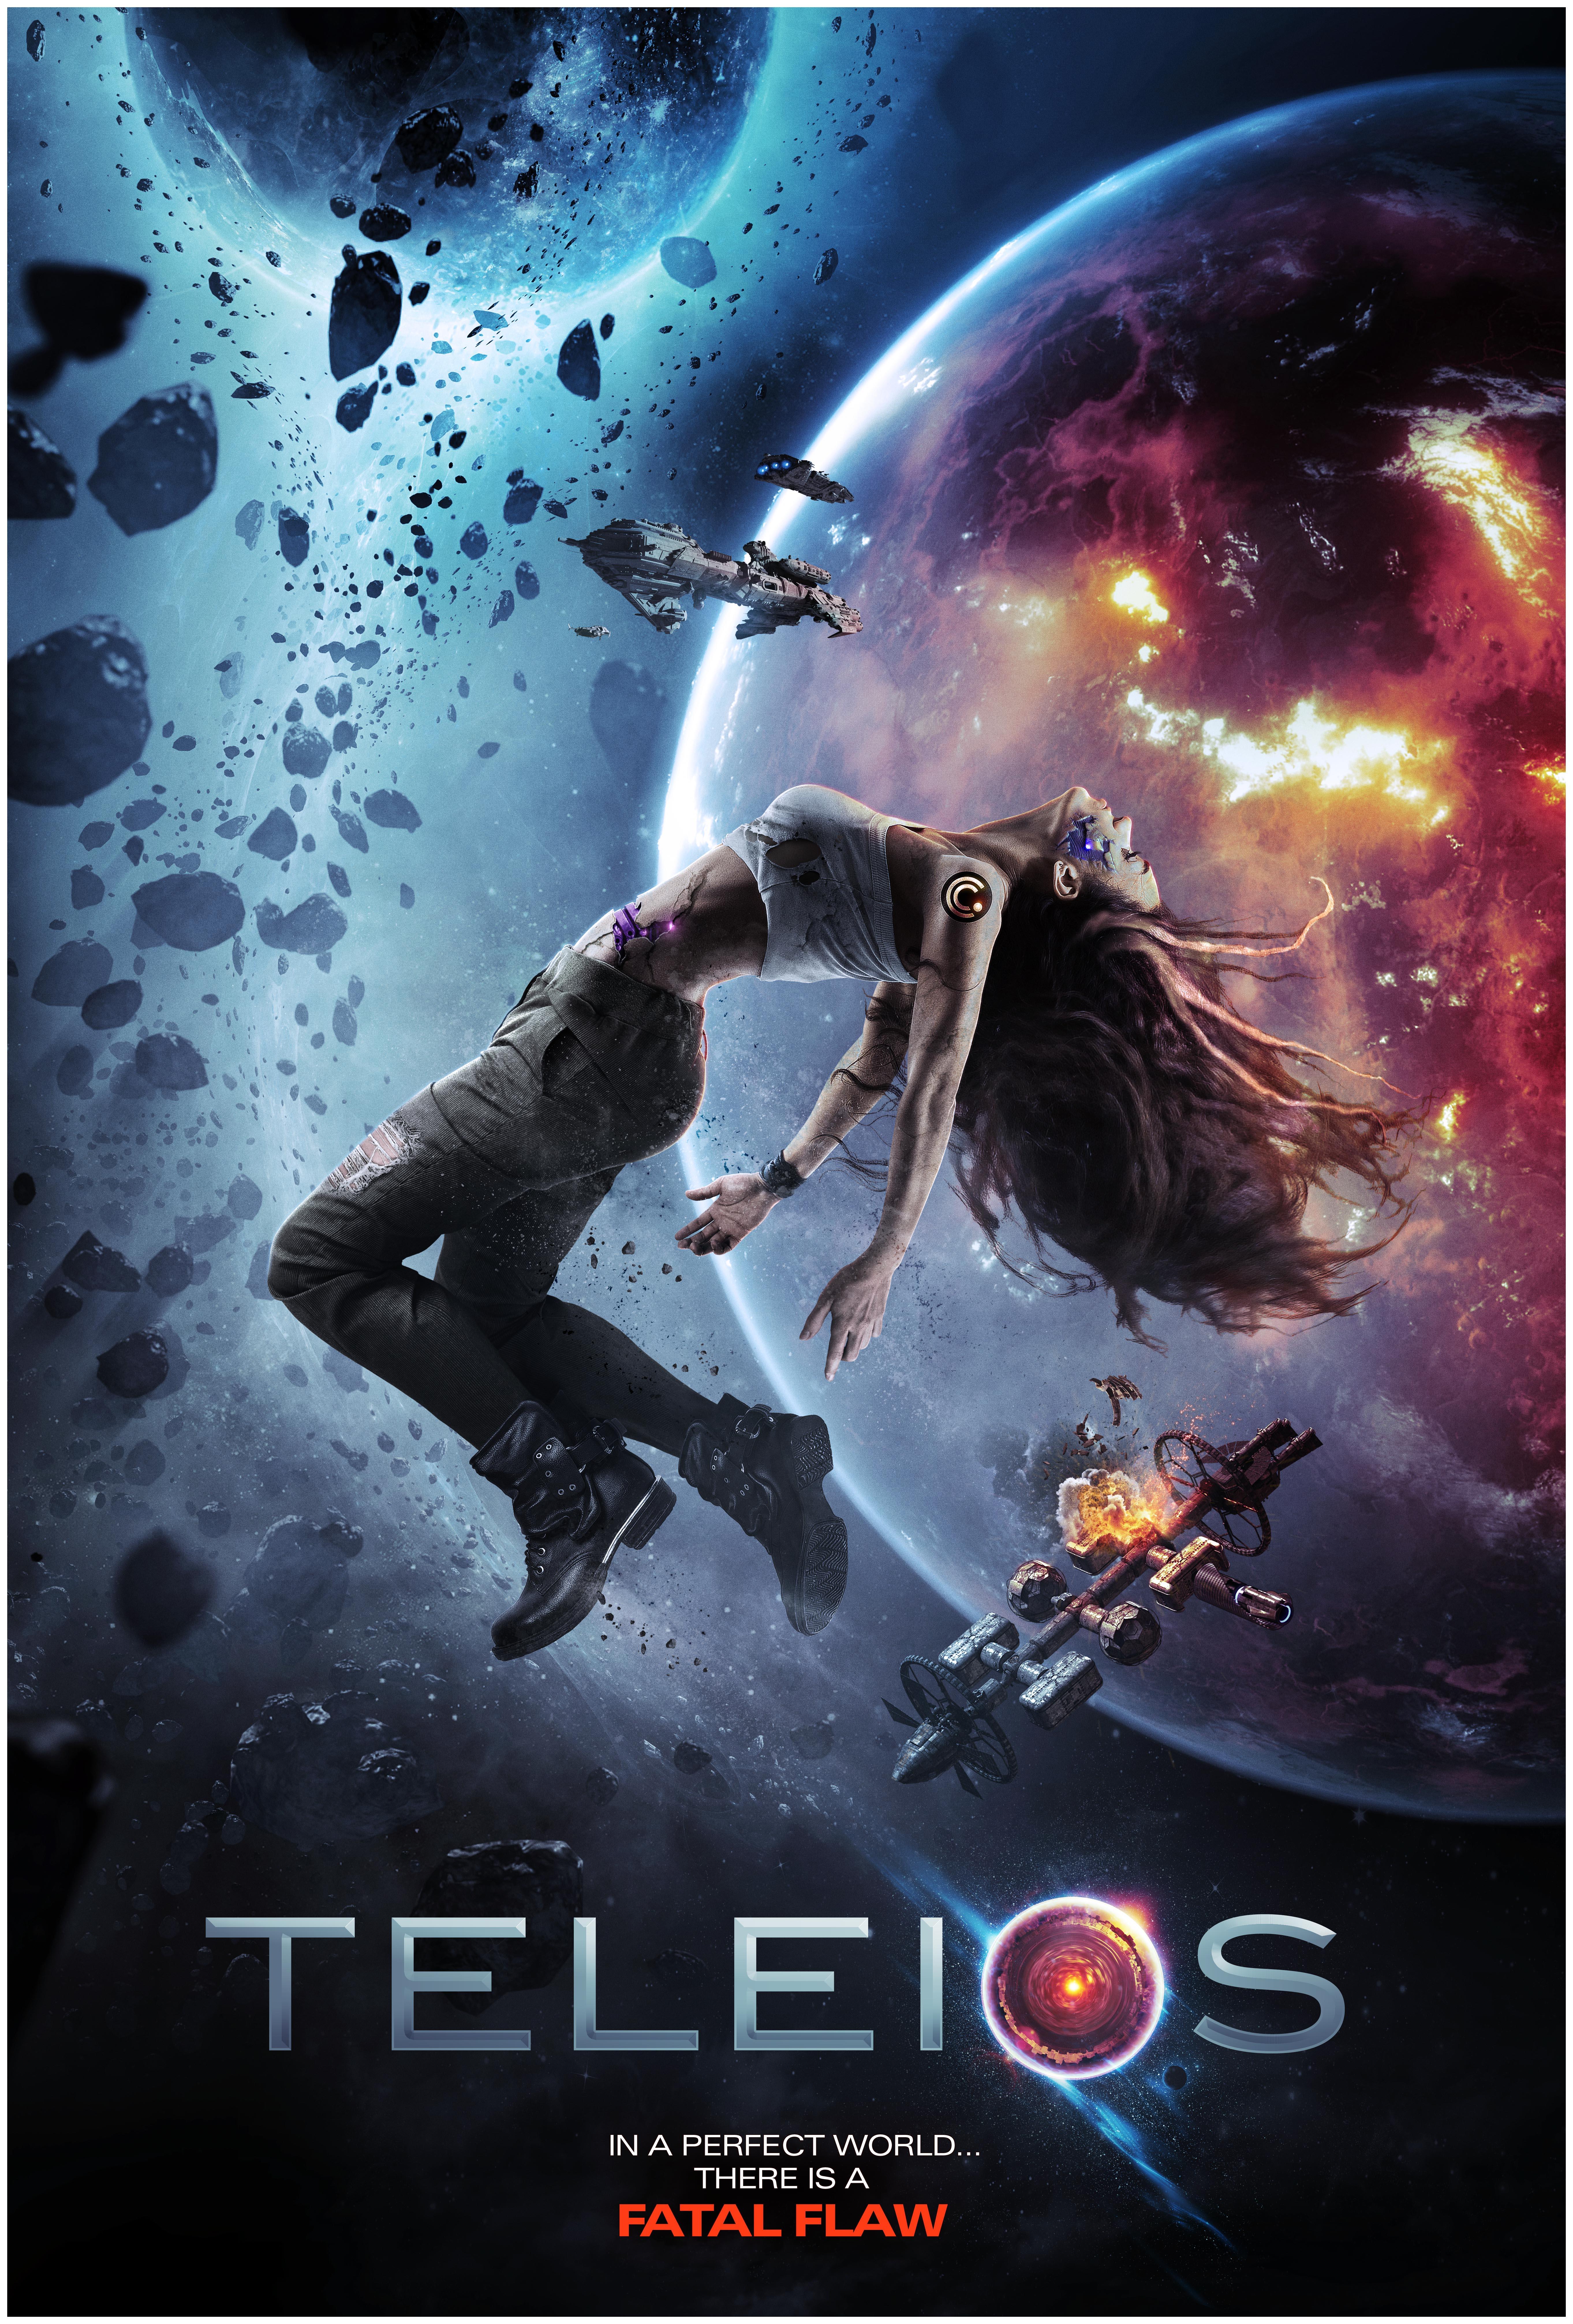 image Teleios Watch Full Movie Free Online